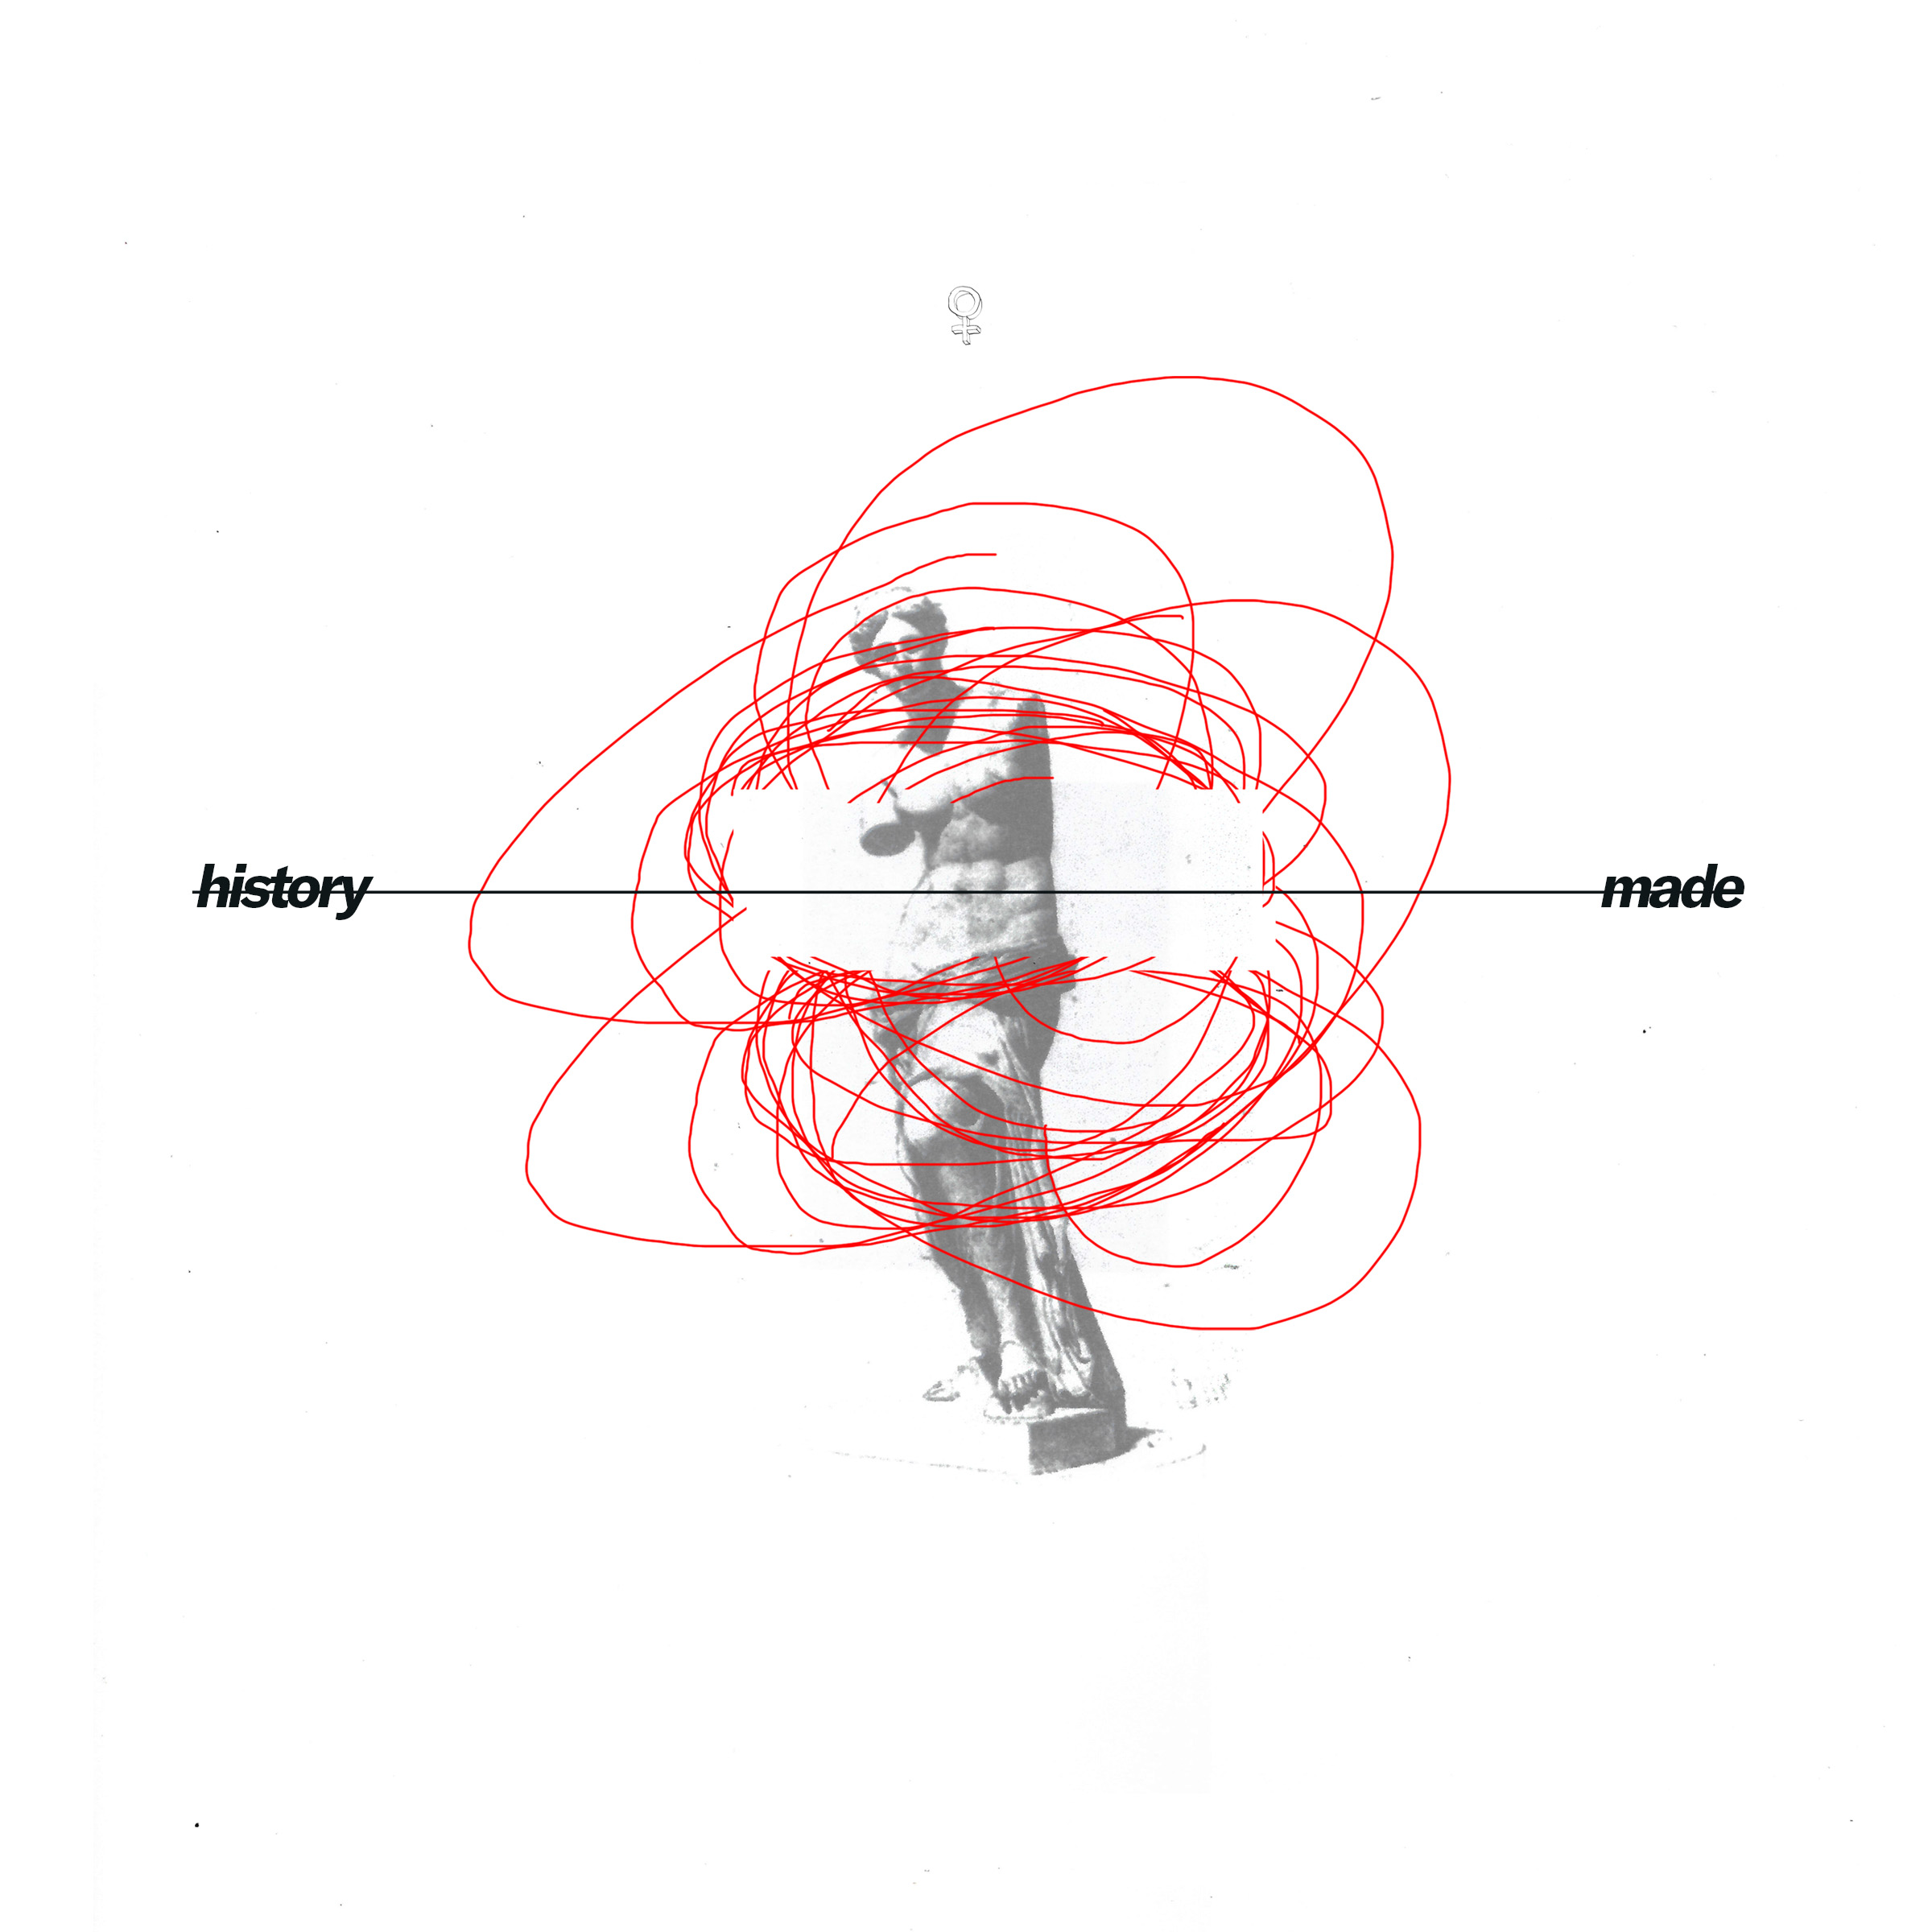 Paradisia - History Made - cover artwork by Anna pesquidous copy.jpg